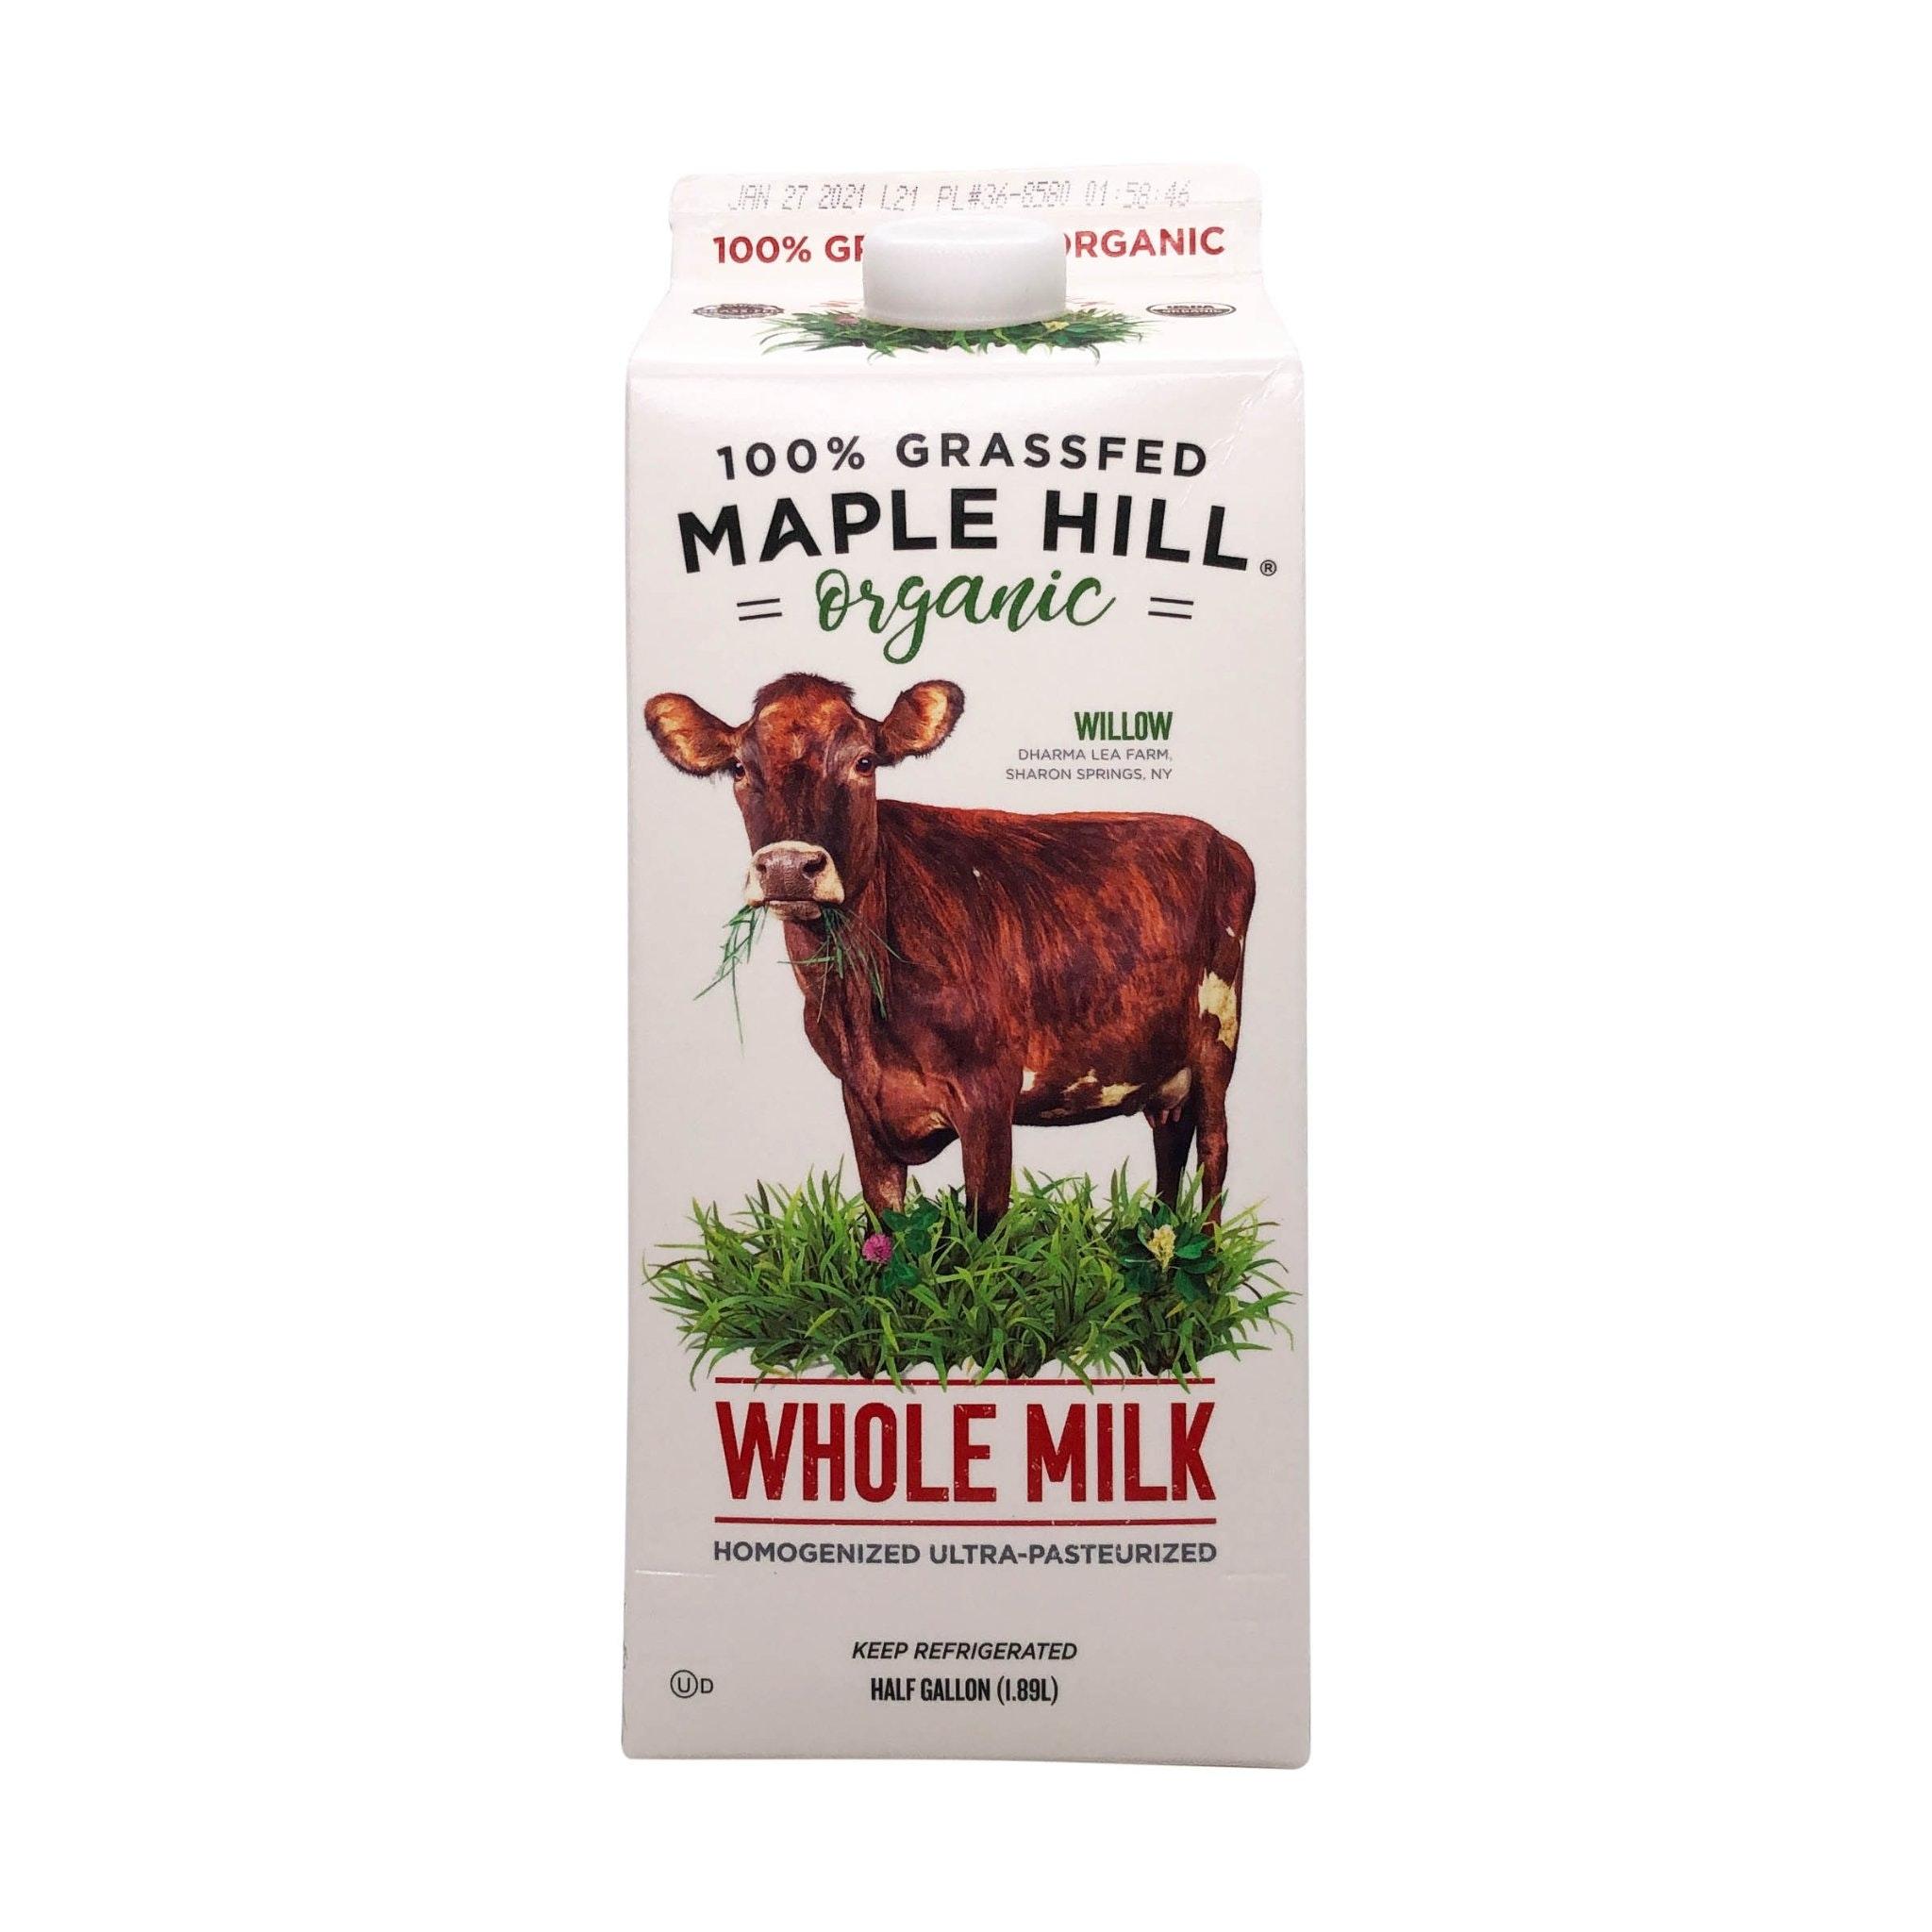 Maple Hill Grassfed Whole Milk